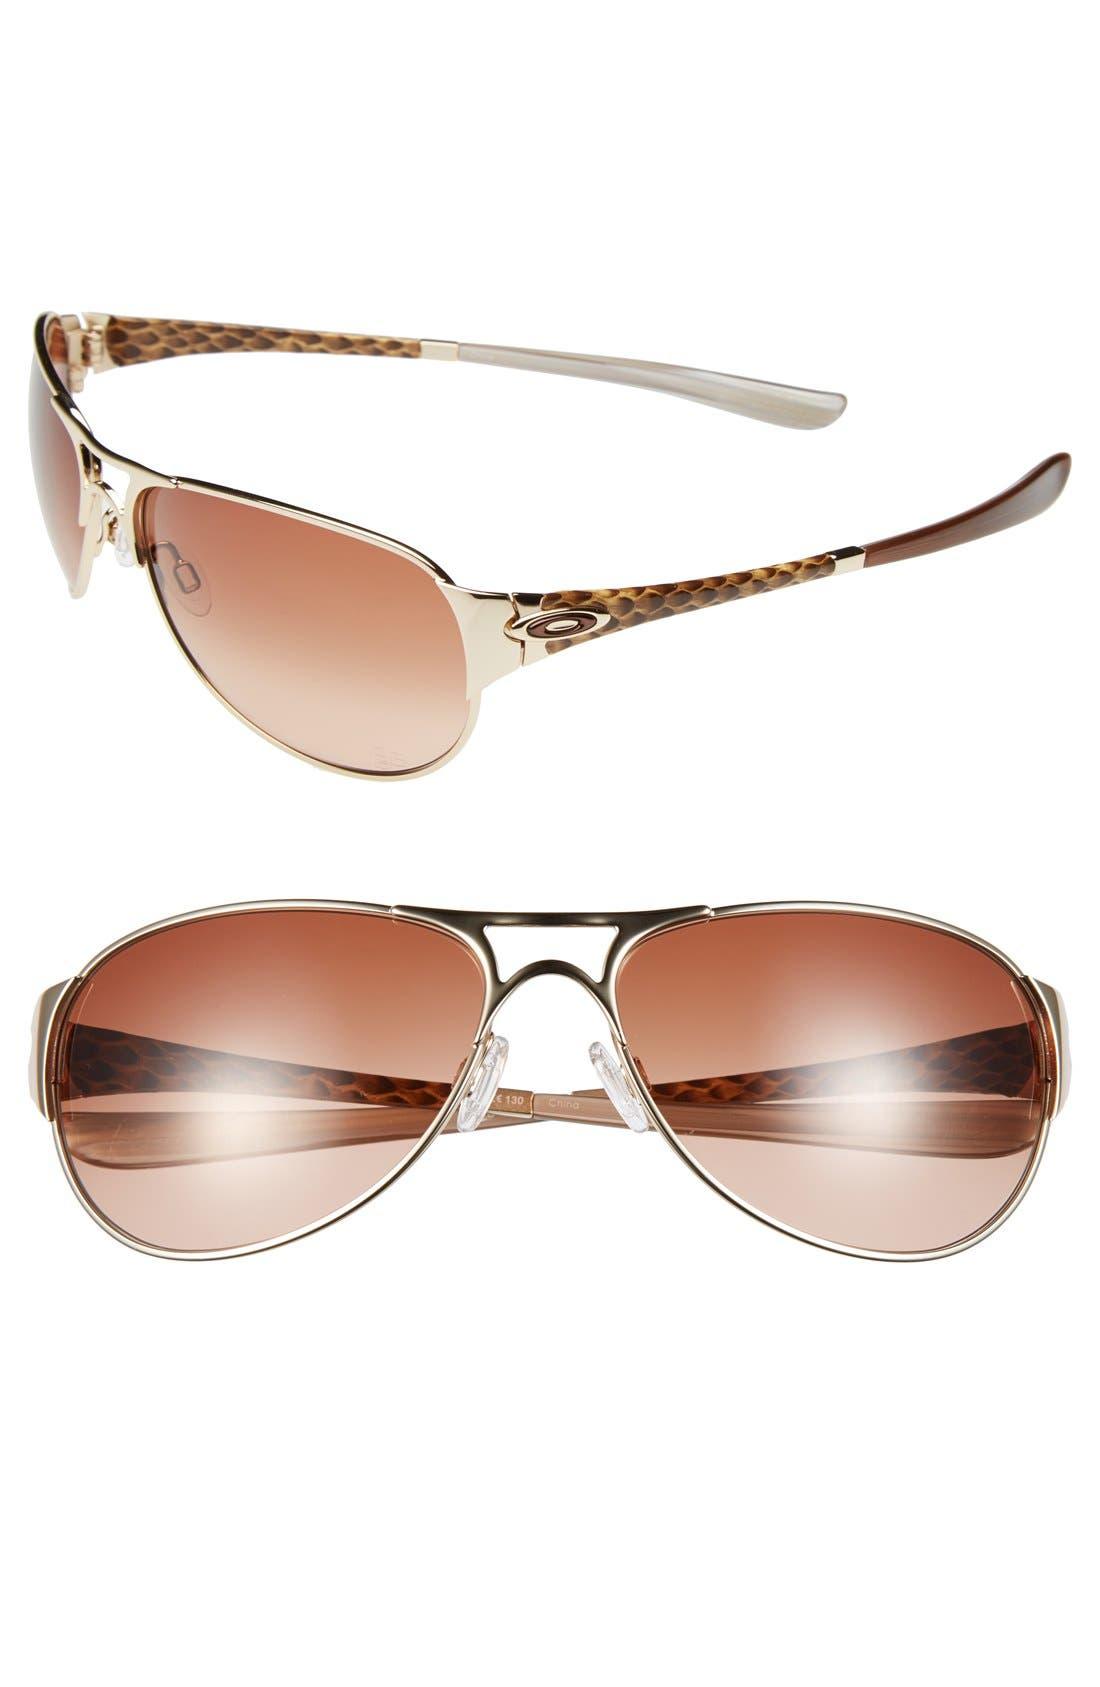 'Gretchen Bleiler Signature Series - Restless' 60mm Sunglasses, Main, color, 710